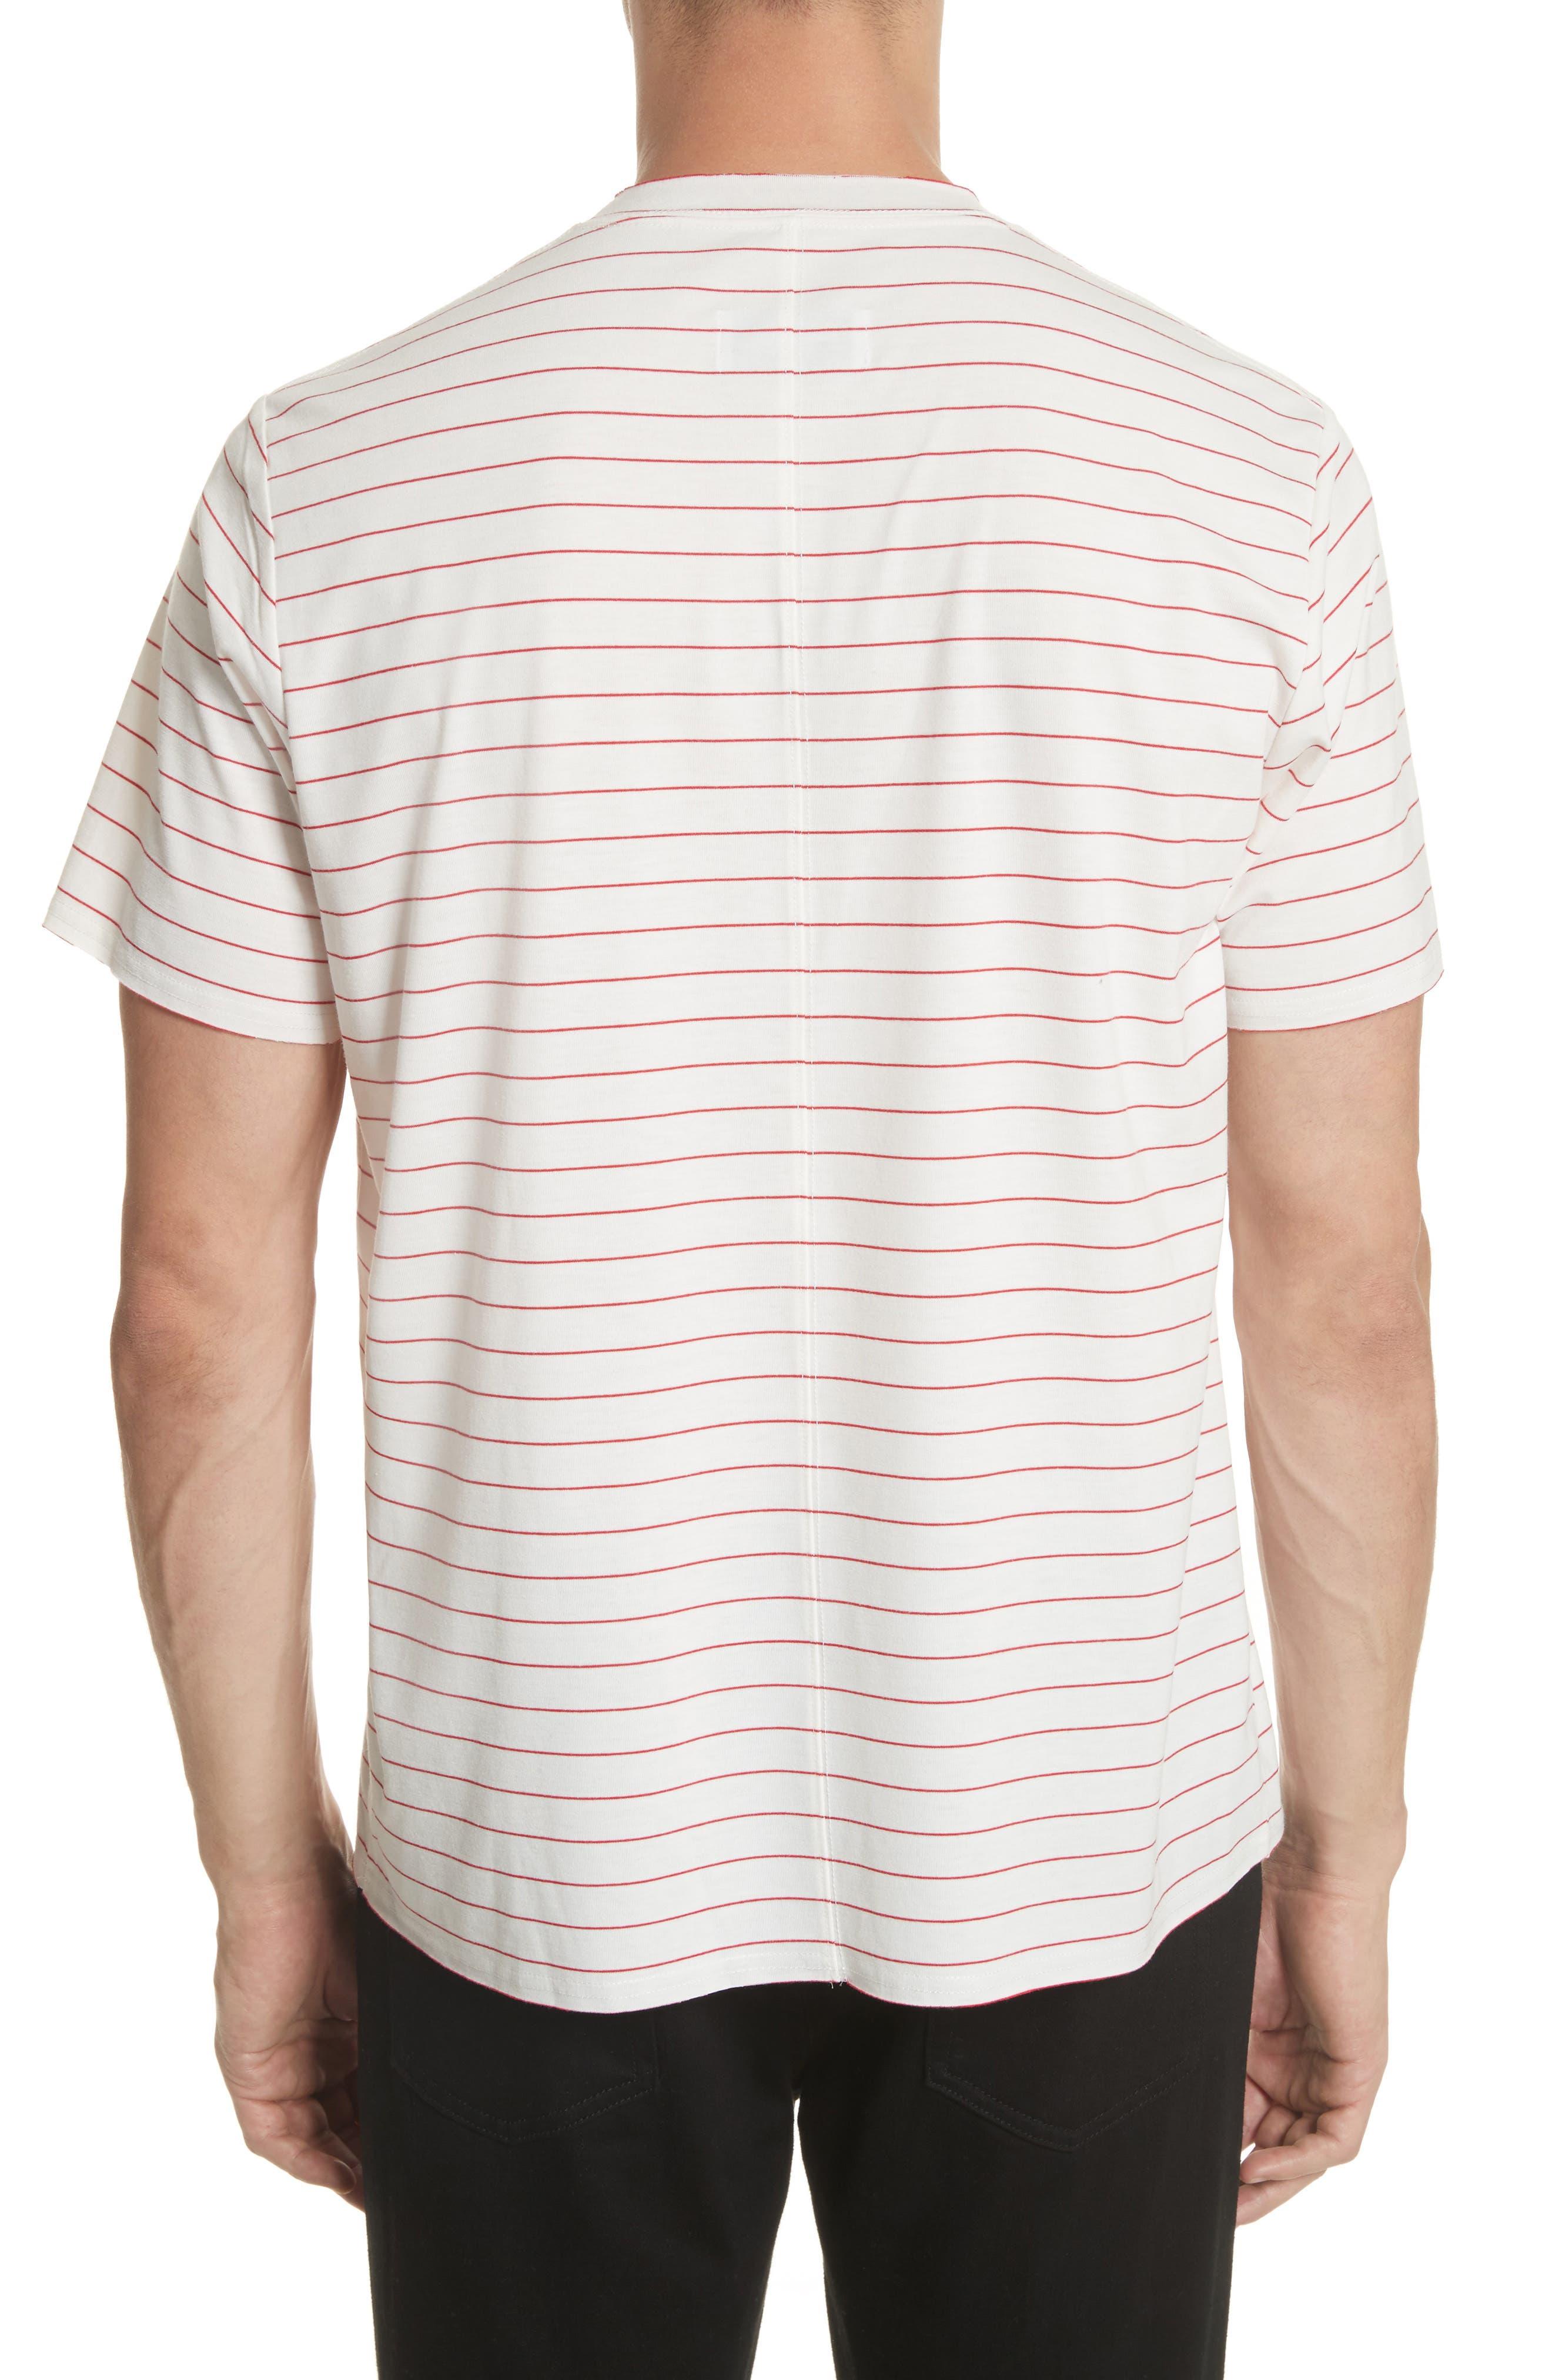 Stripe Crewneck T-Shirt,                             Alternate thumbnail 2, color,                             White/ Red